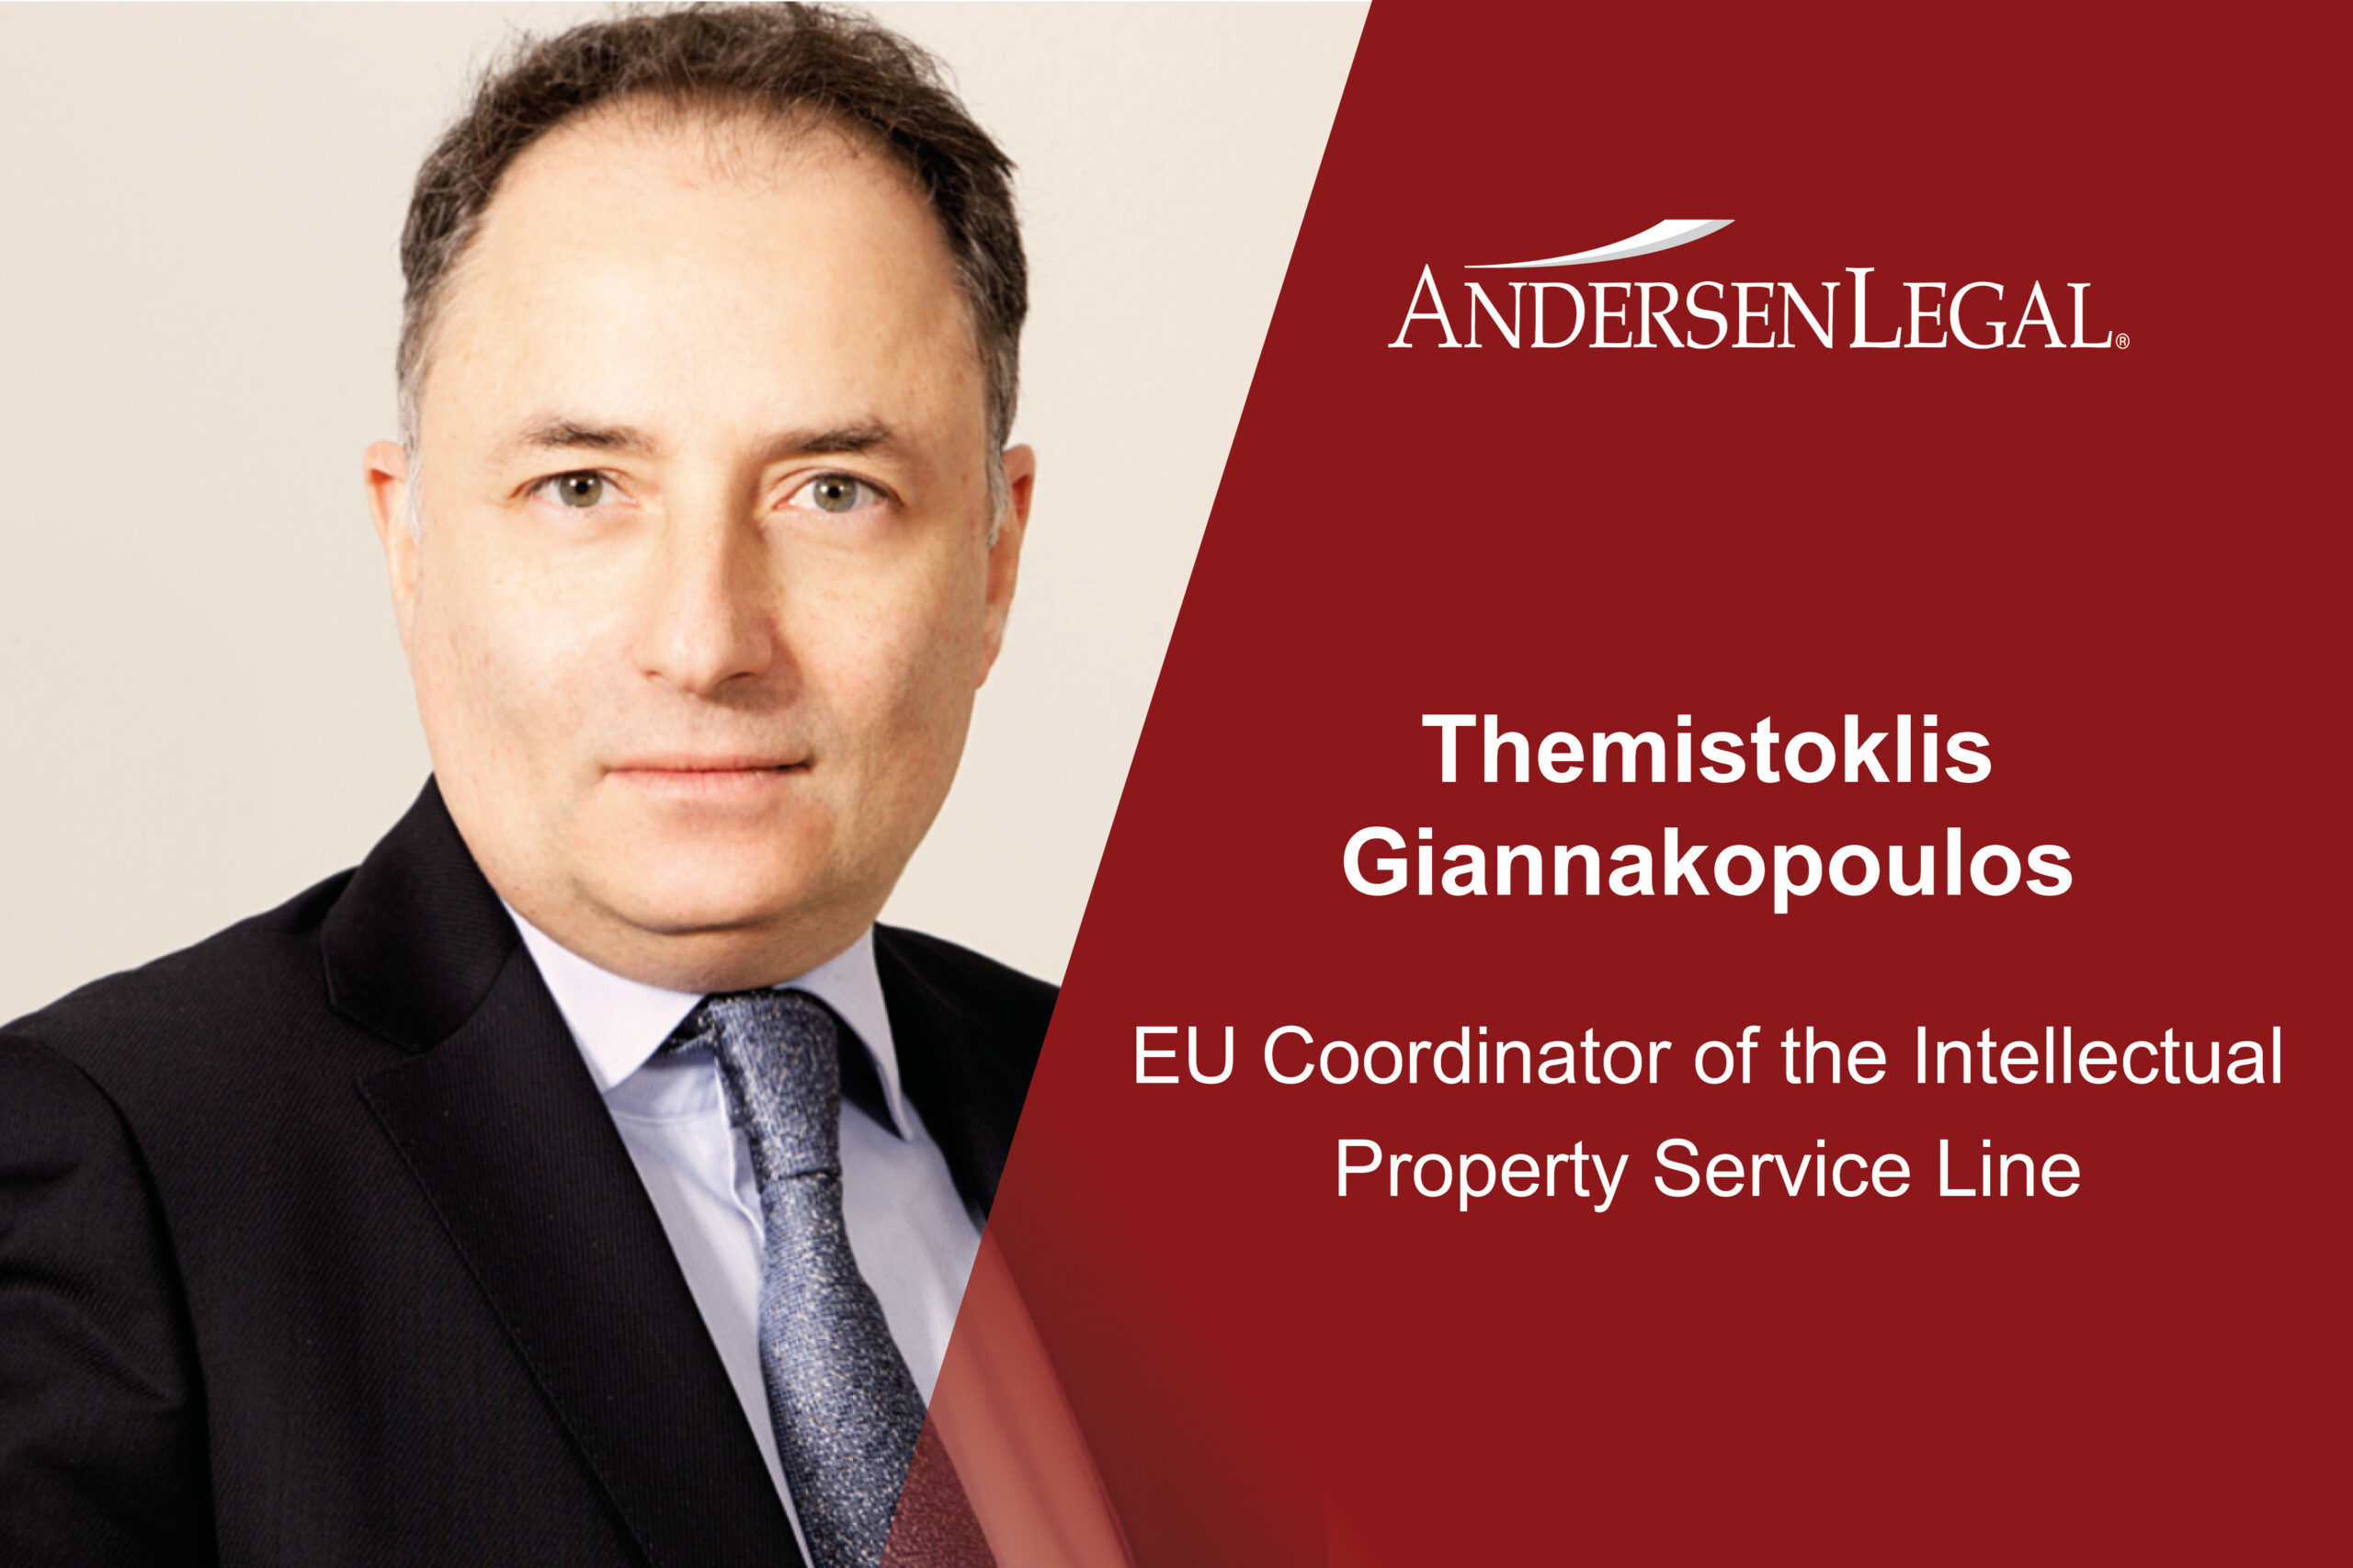 Themistoklis Giannakopoulos: EU Coordinator of the Intellectual Property Service Line